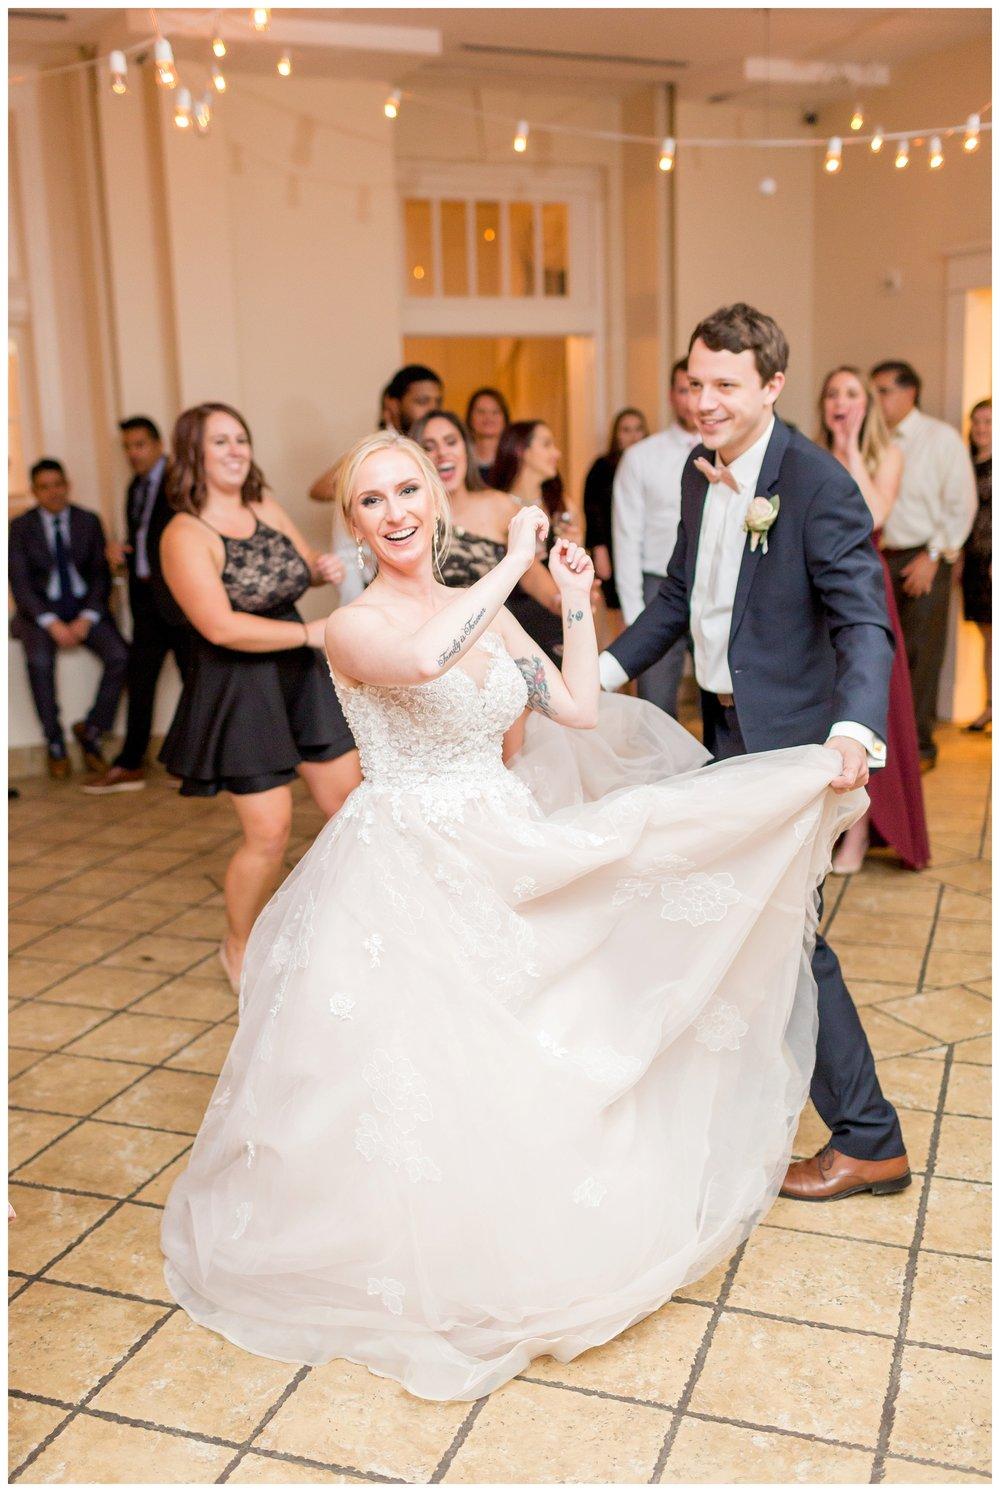 Whitehall Estate Wedding | Northern Virginia Wedding Photographer Kir Tuben_0122.jpg